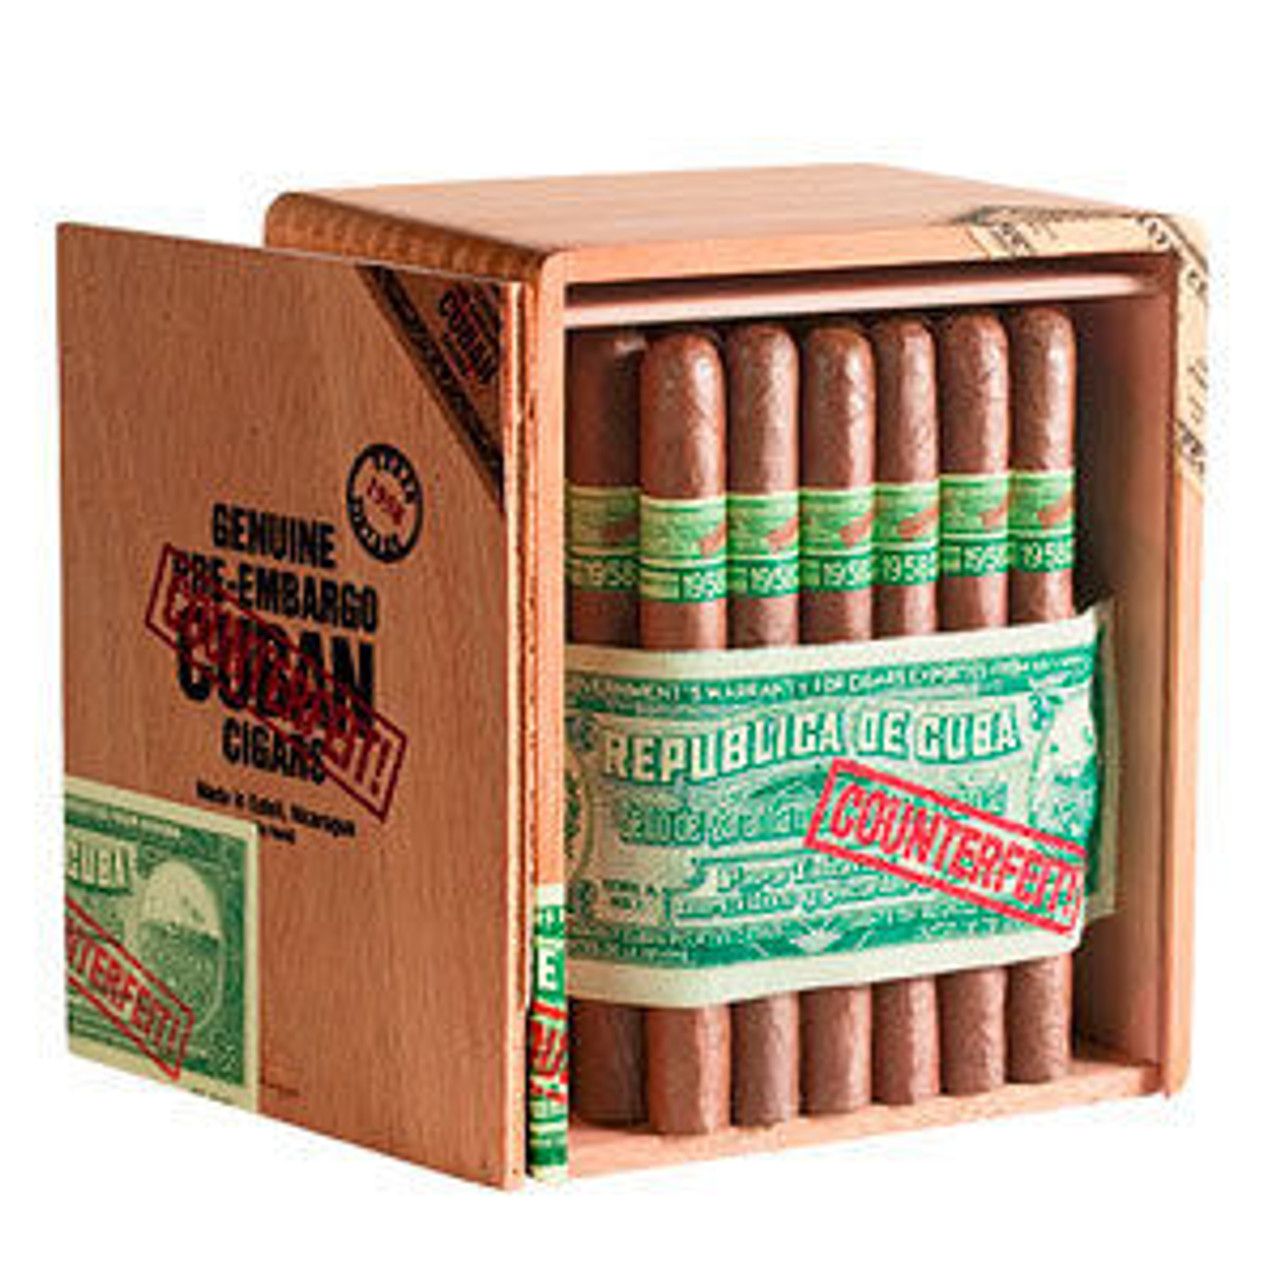 Genuine Pre-Embargo Counterfeit Cubans 1958 Corona Major Cigars - 5.62 x 44 (Cedar Chest of 50)